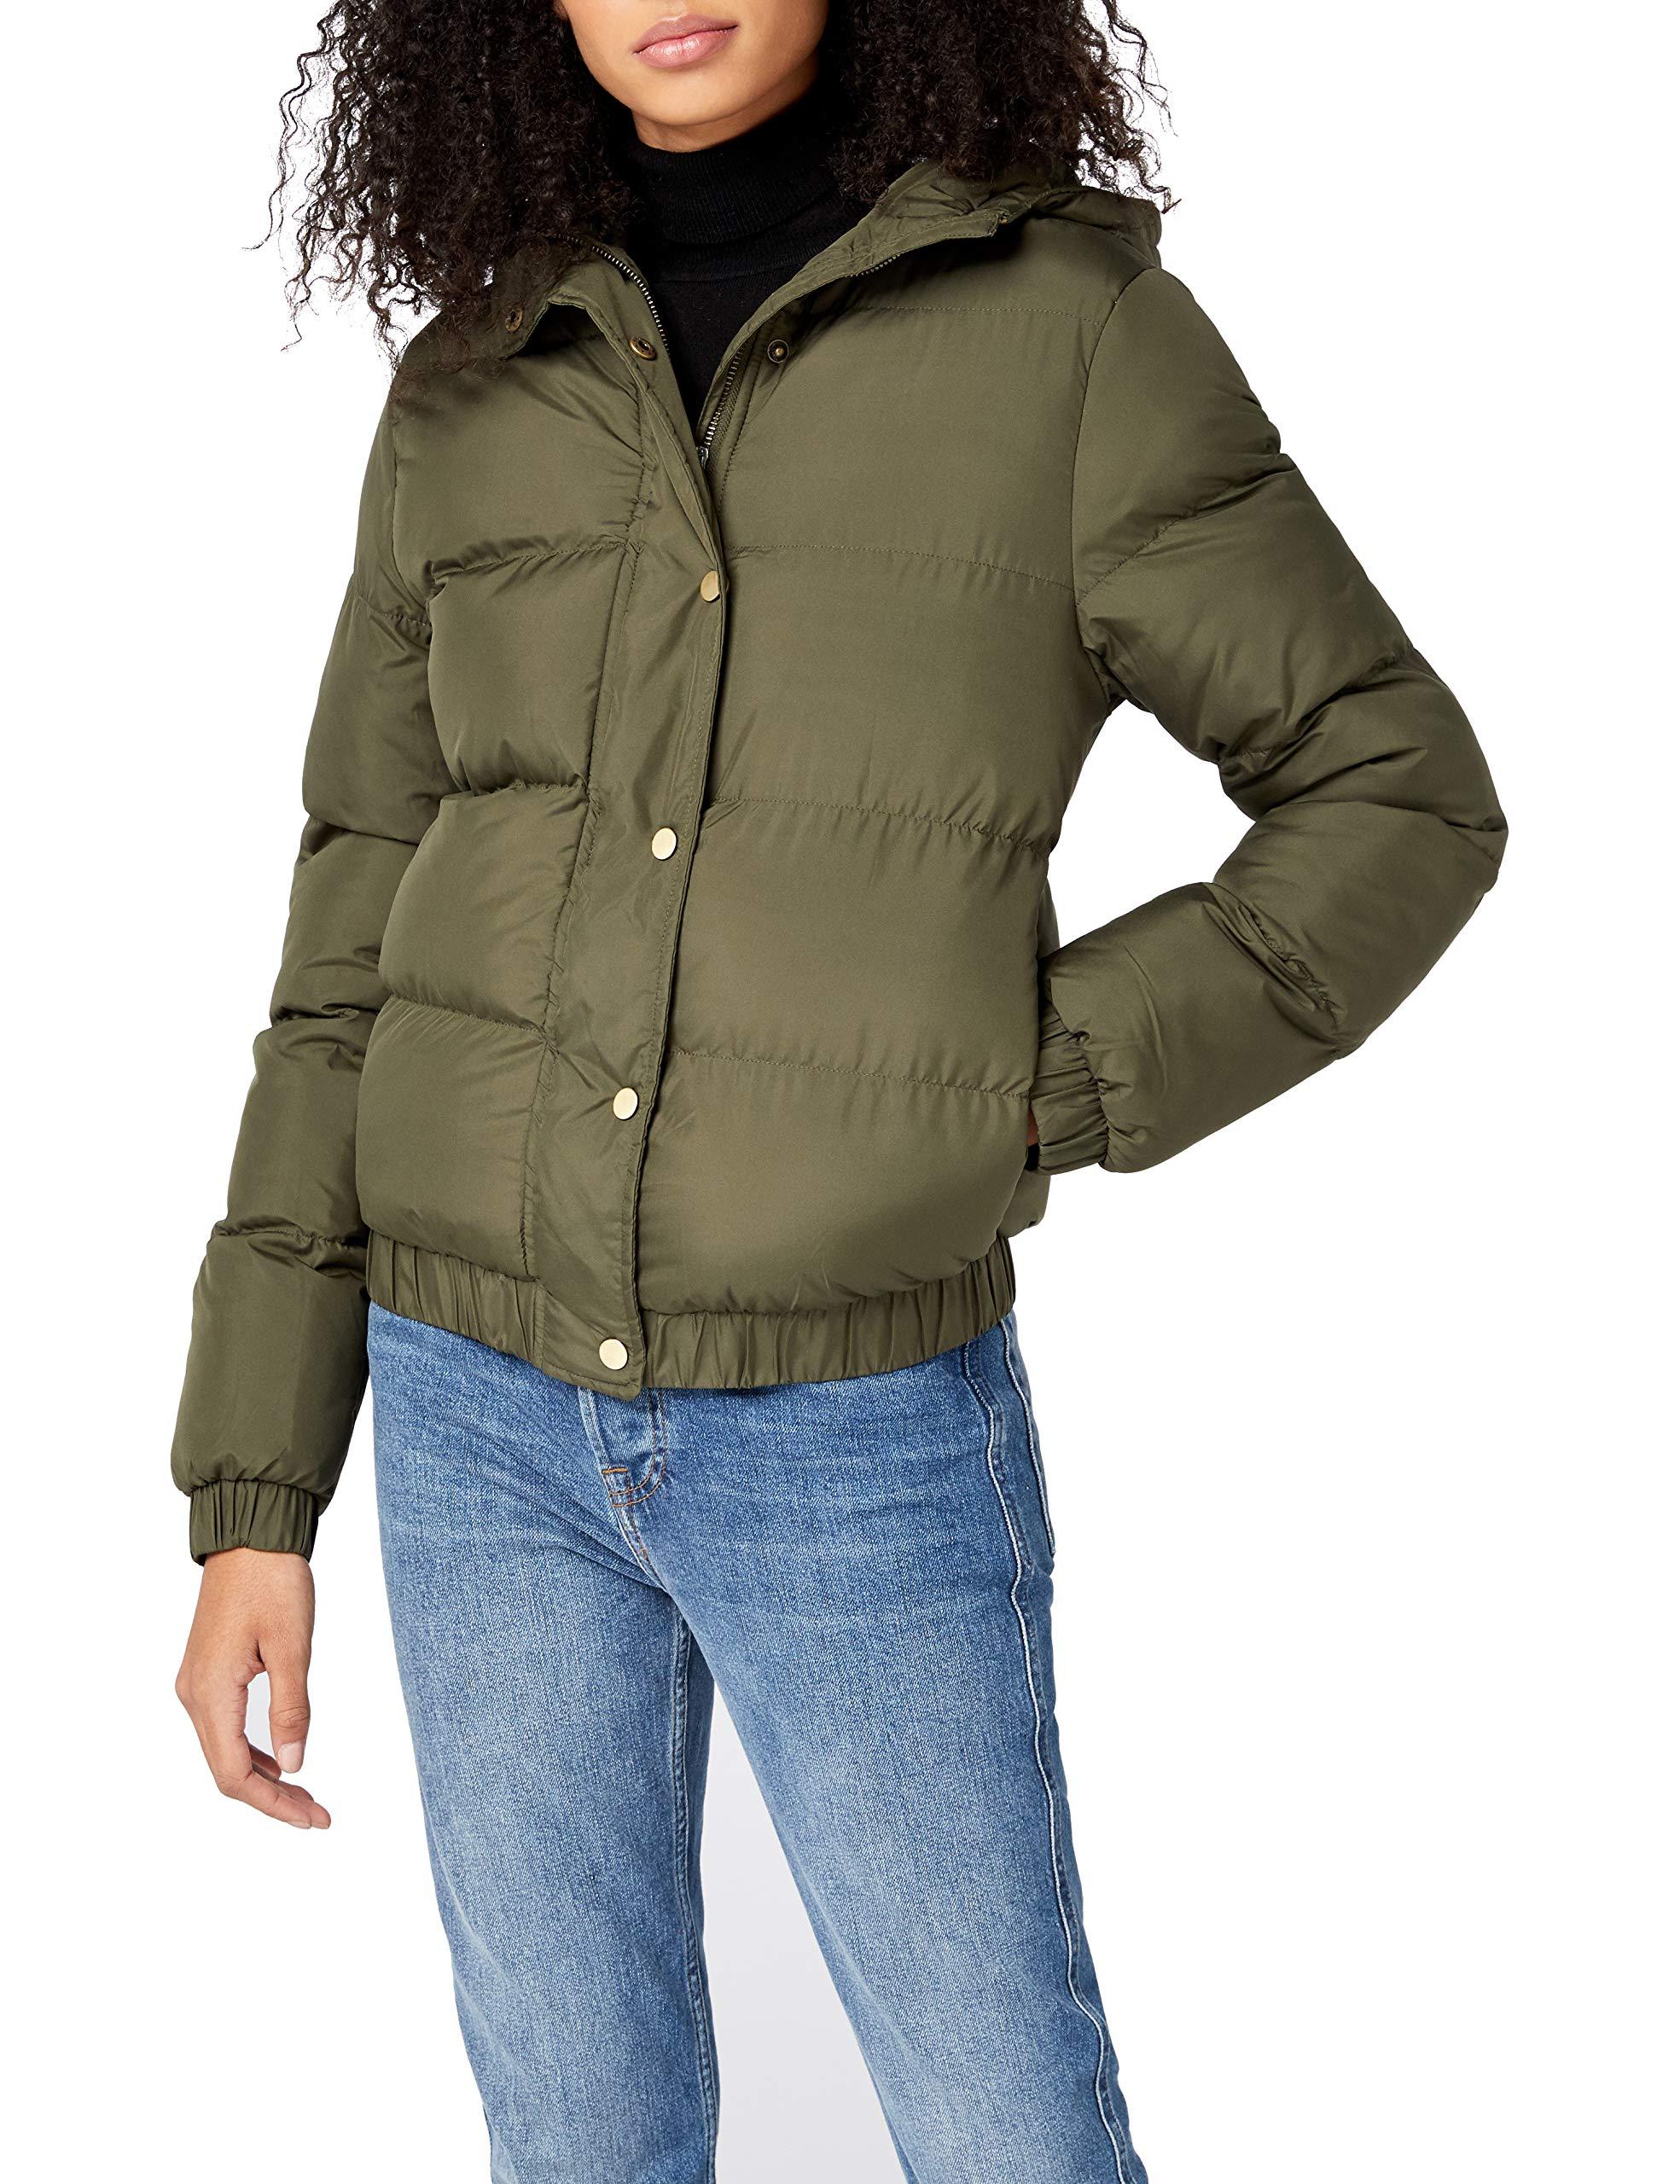 Classics BlousonVertdarkolive Hooded Femme Jacket Puffer 551S Urban Ladies Nmw8n0